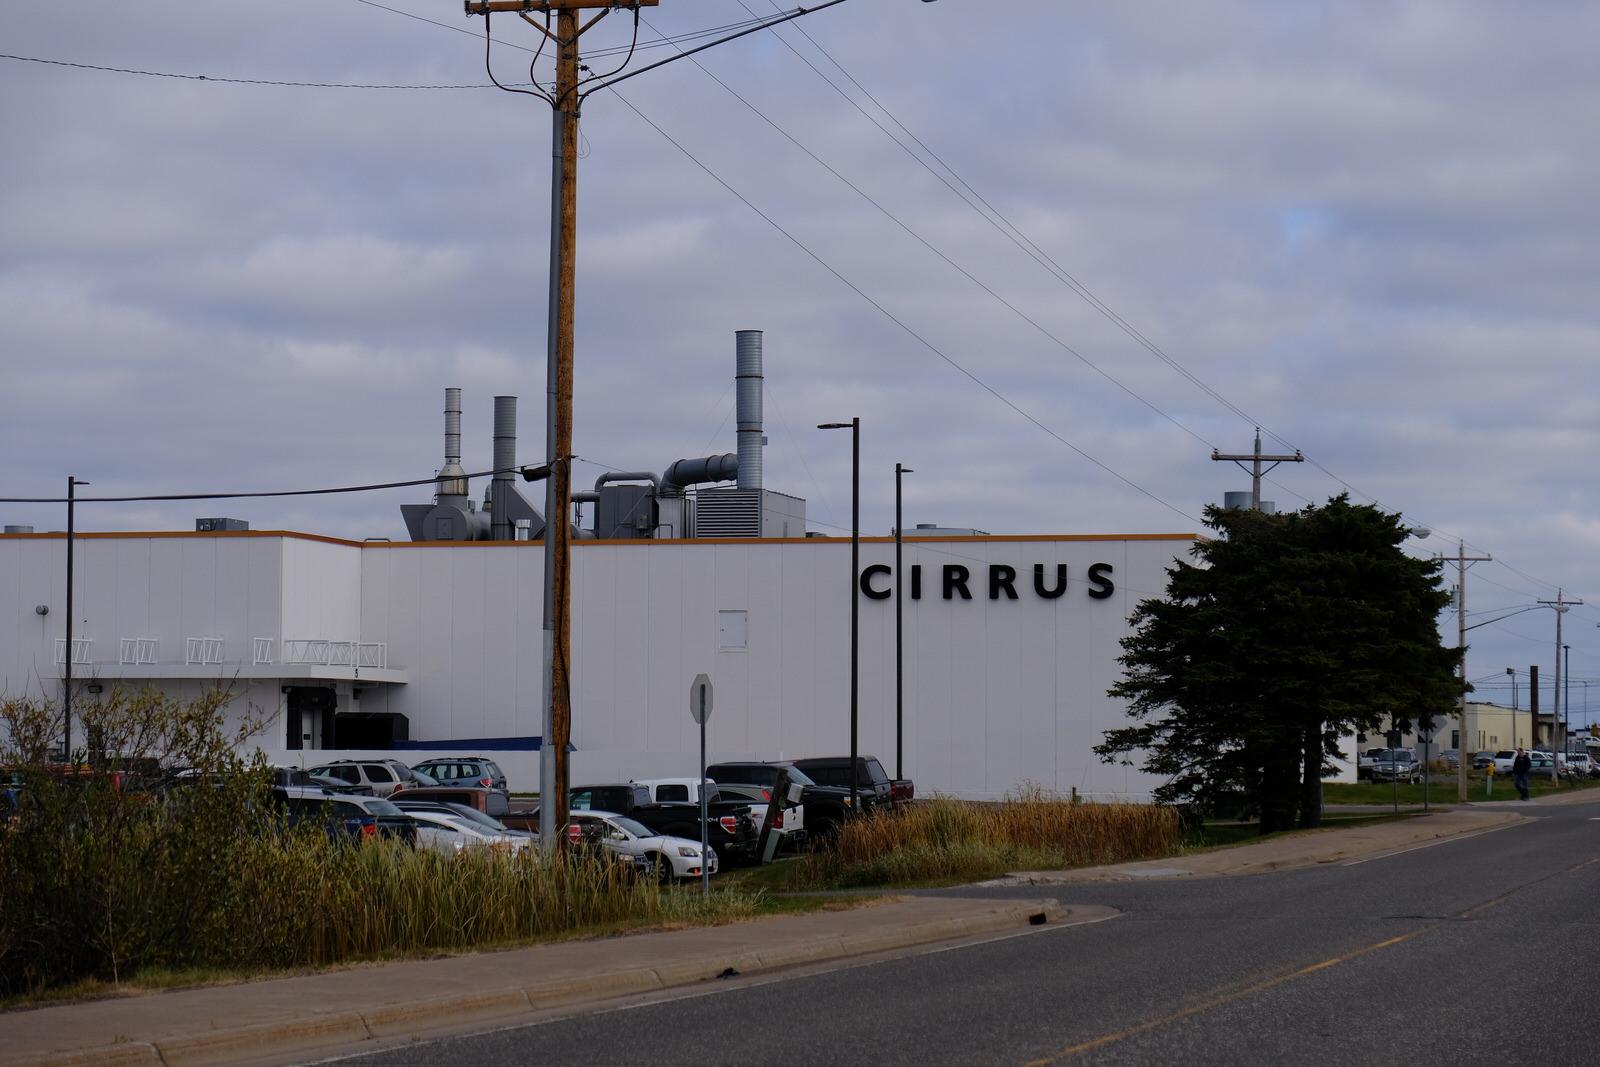 Cirrus Aircraft Corp.